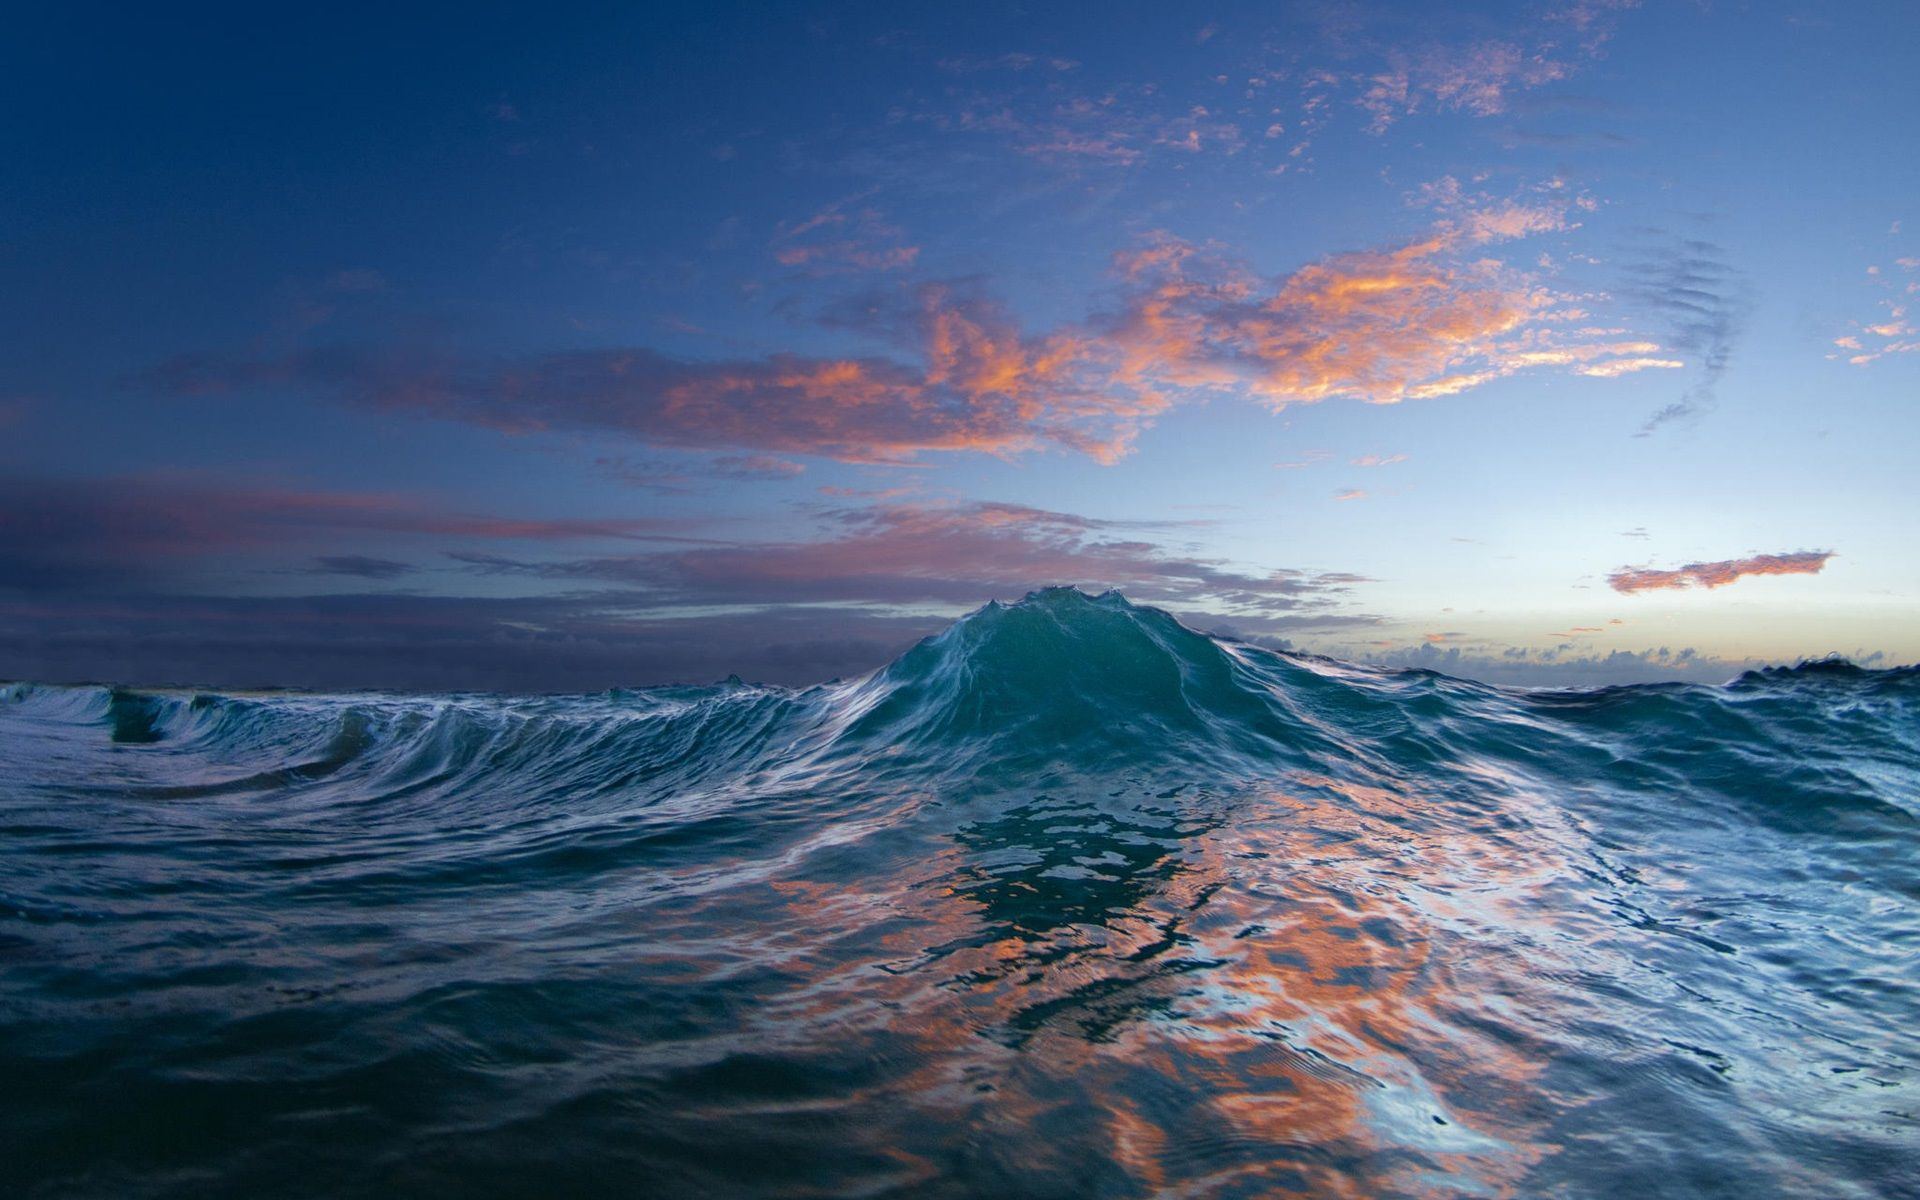 Ocean-sunset-sea-wave-water